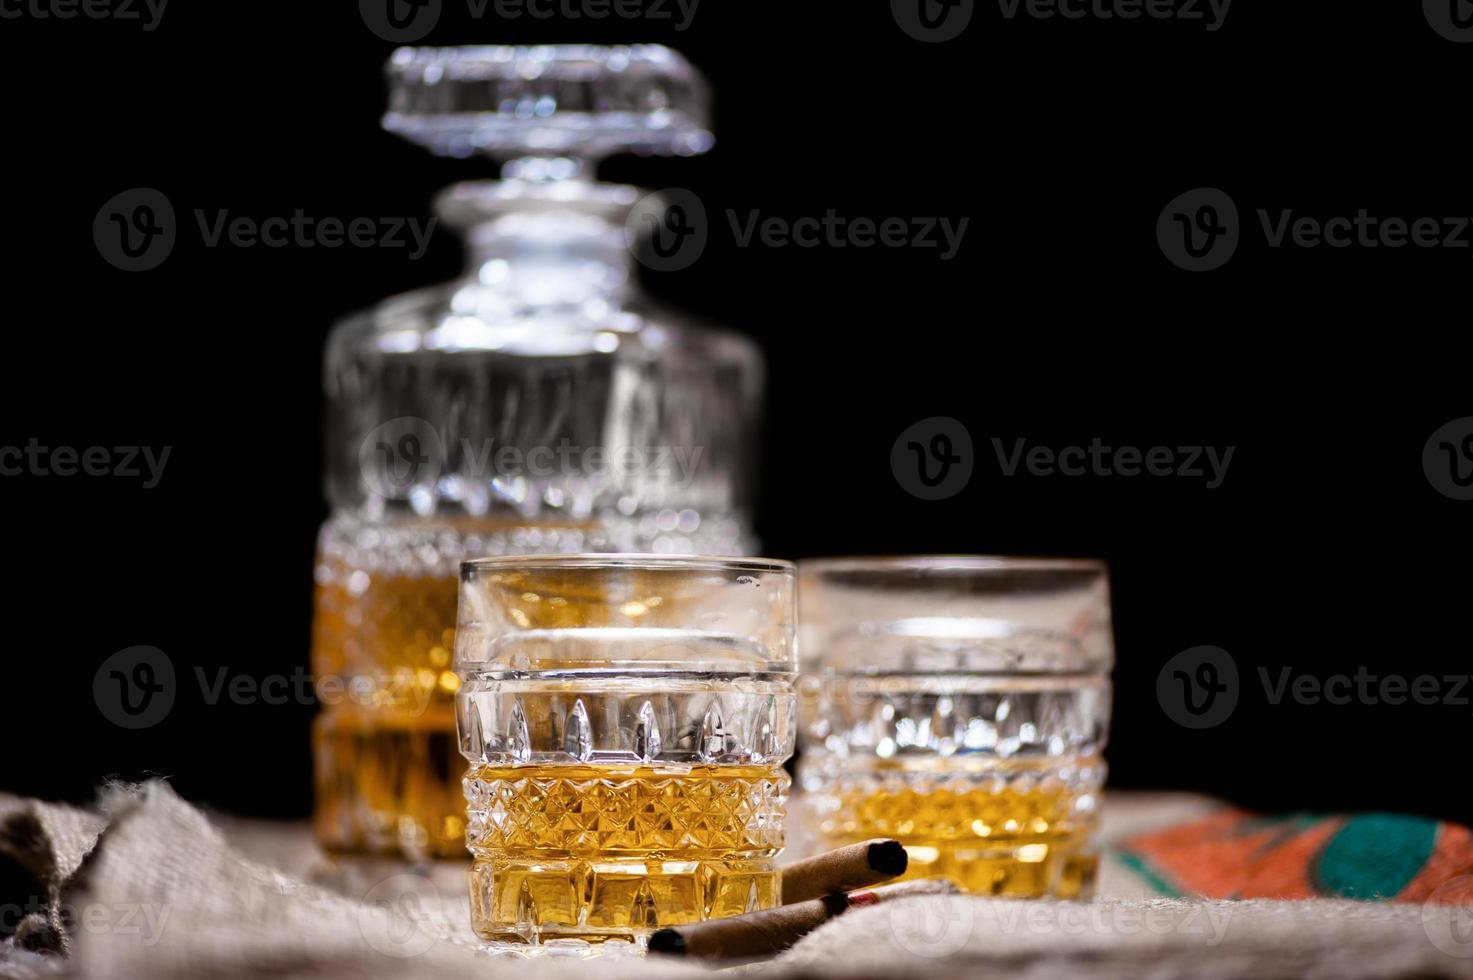 whisky en whisky drankjes op hout met bar fles foto